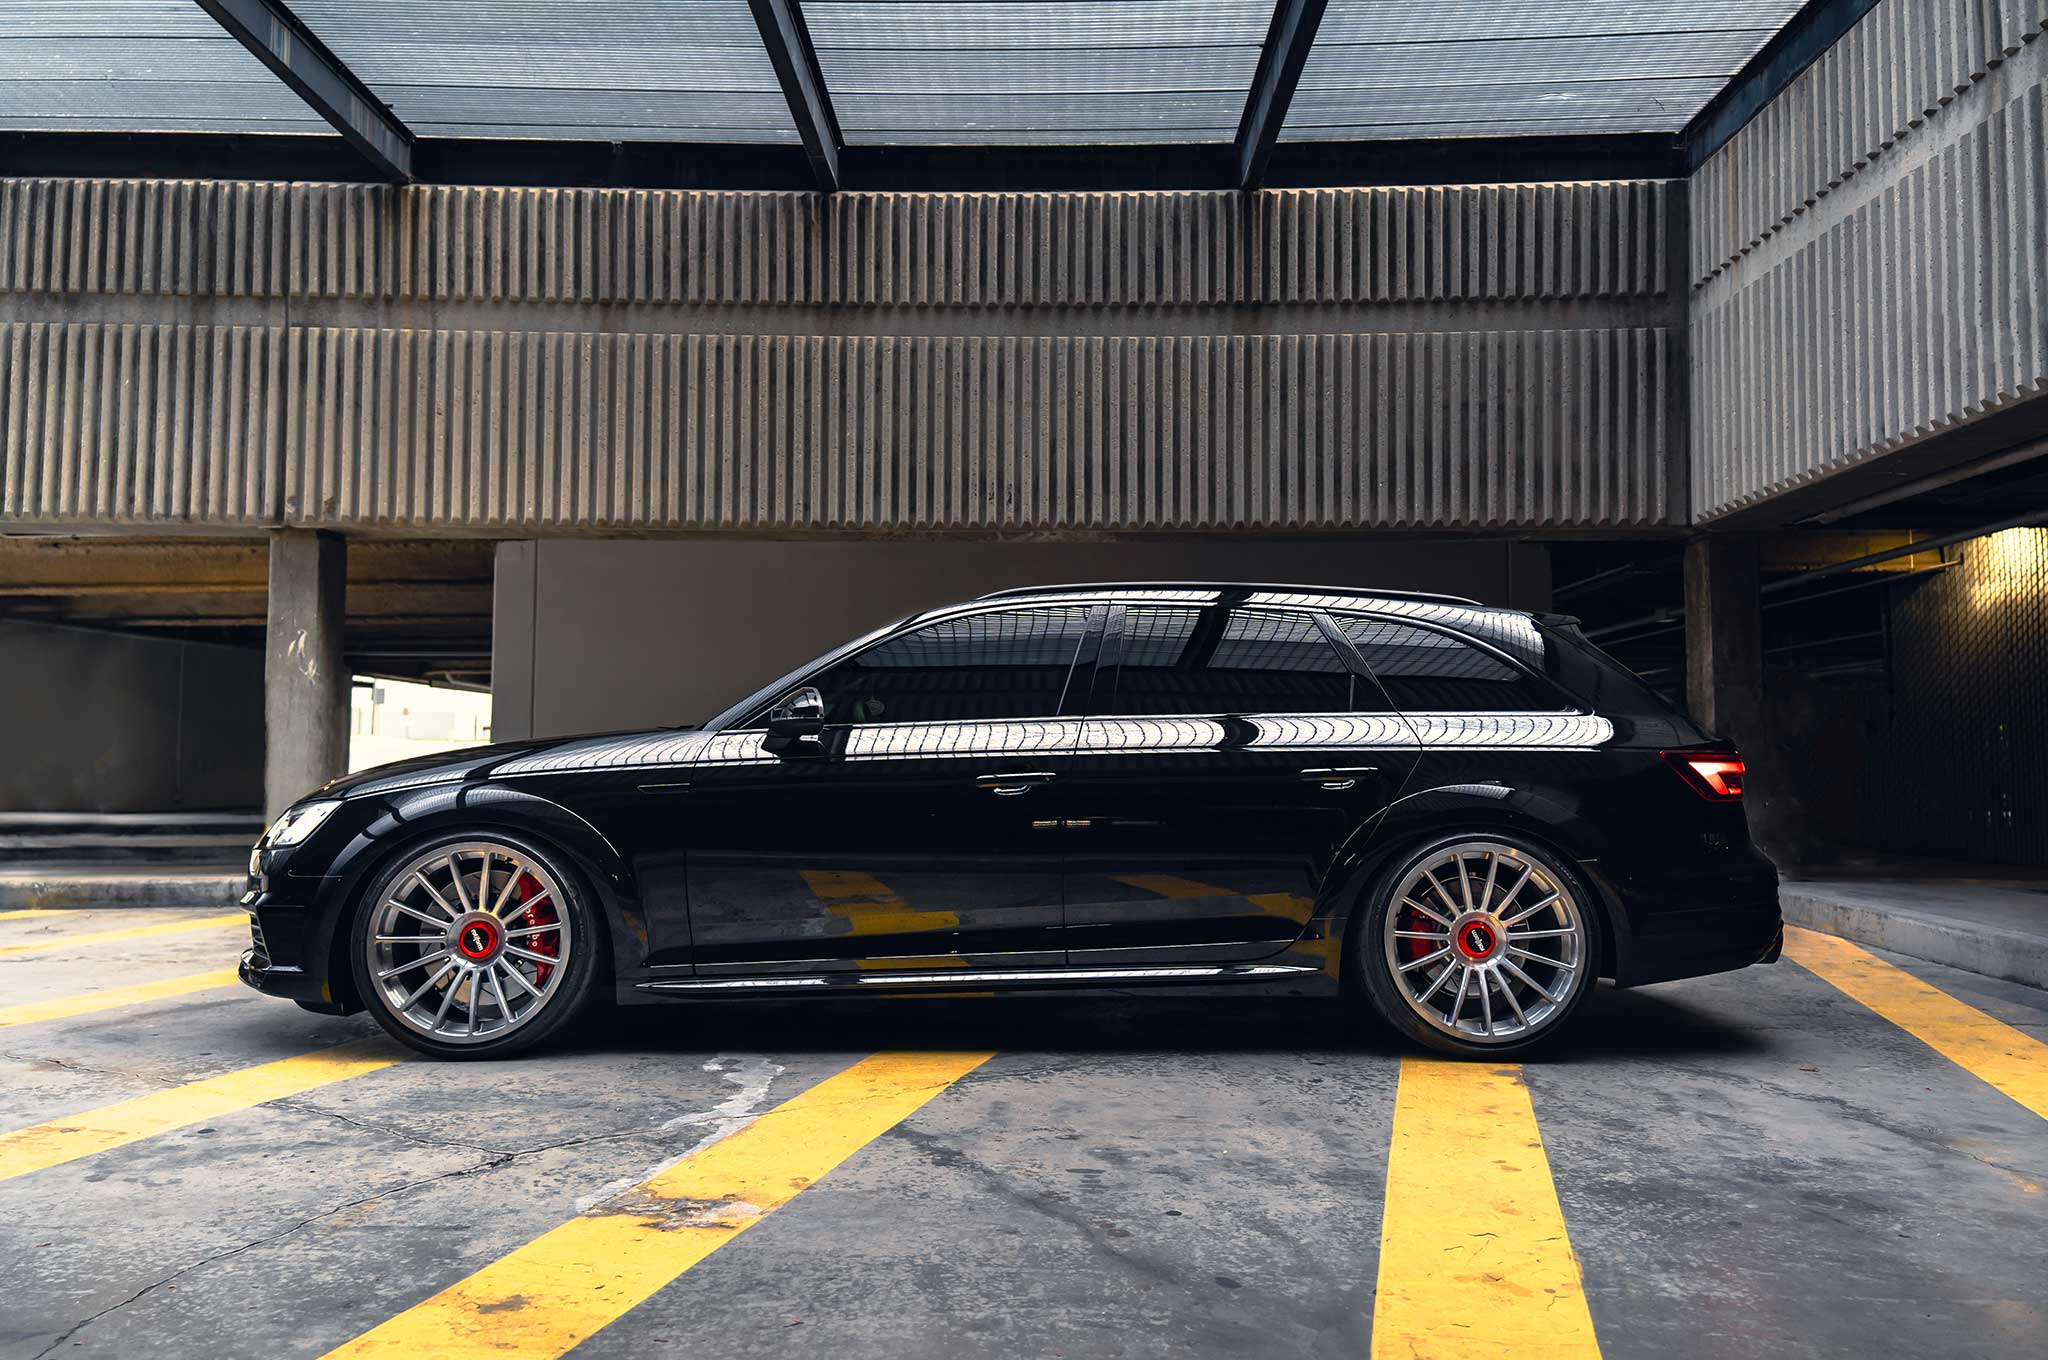 Audi Allroad Turbo S4 Engine Swap